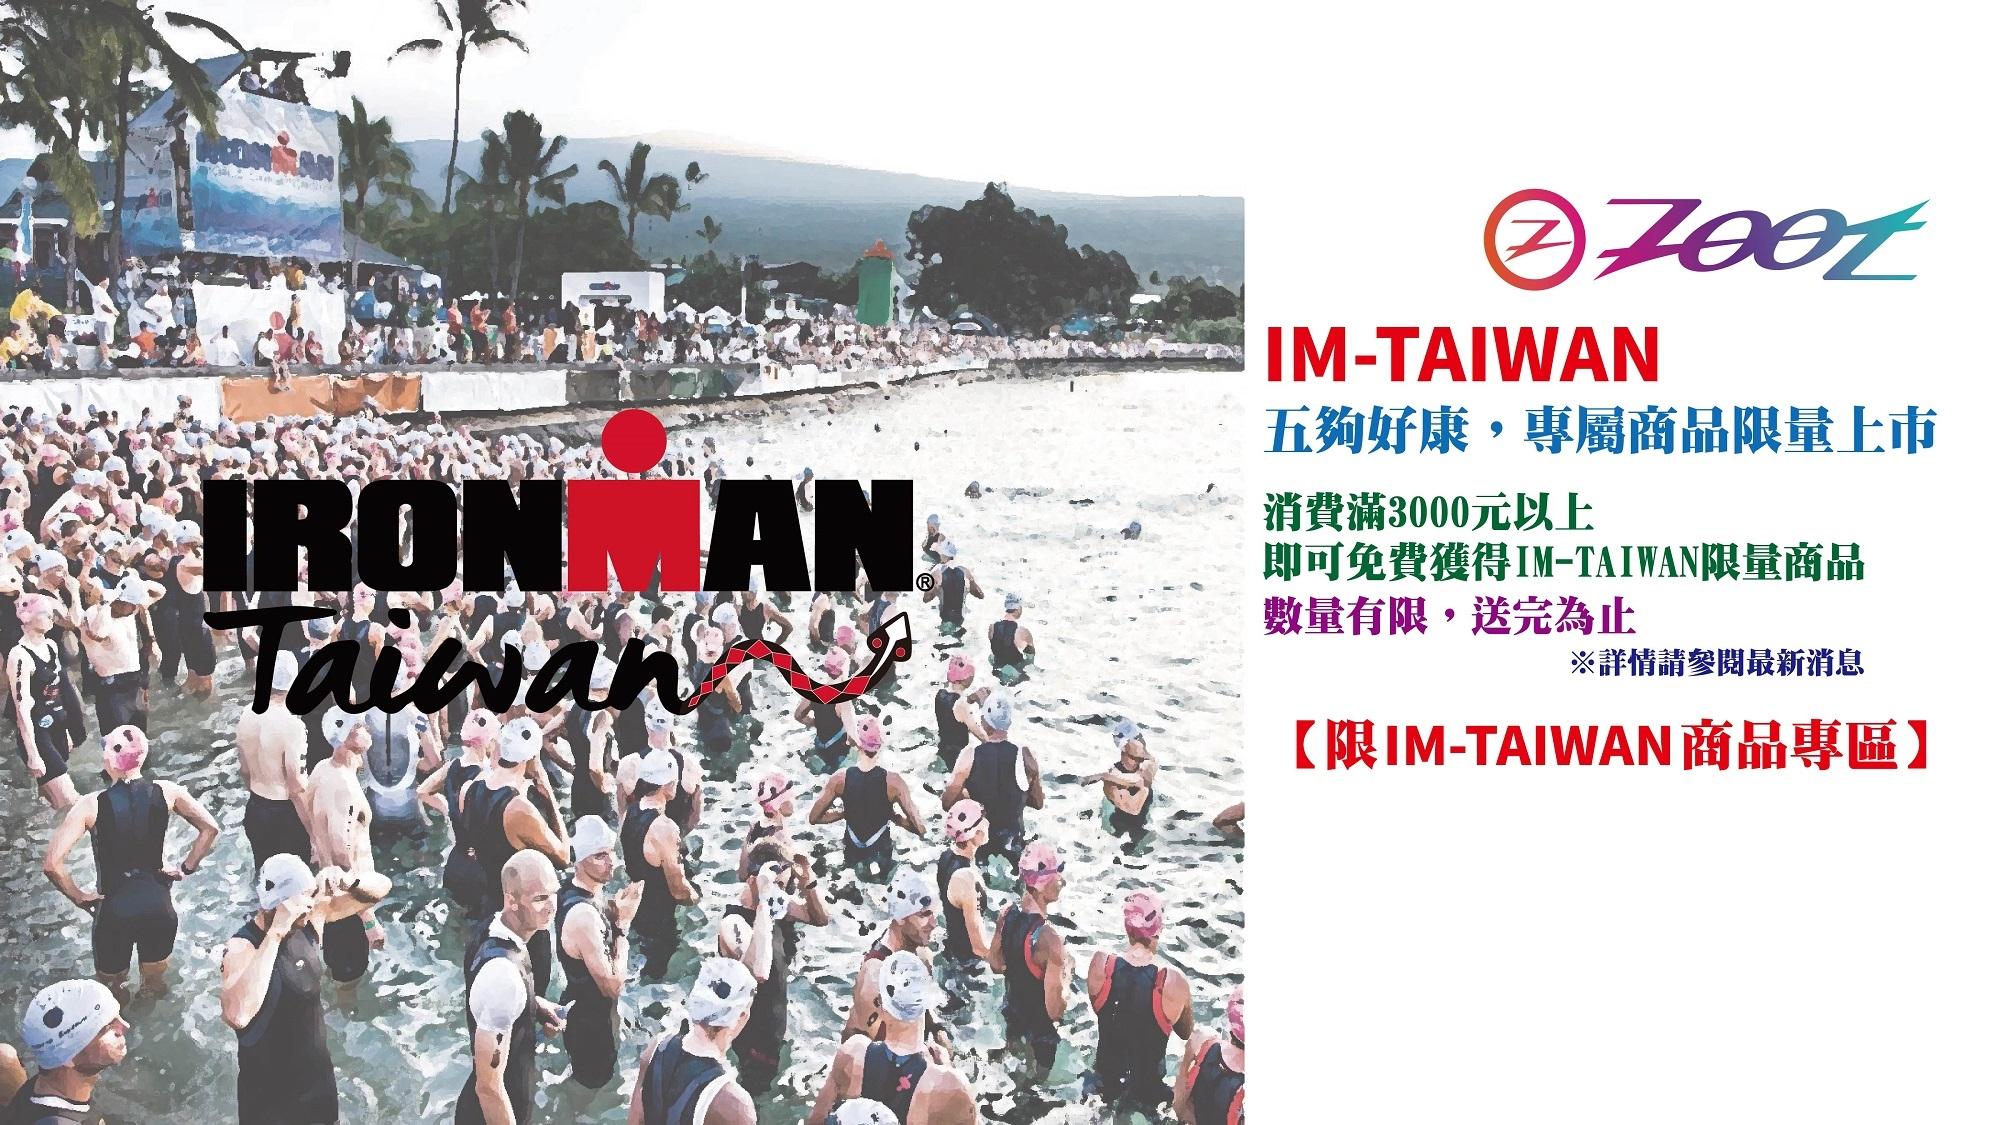 IM-TAIWAN